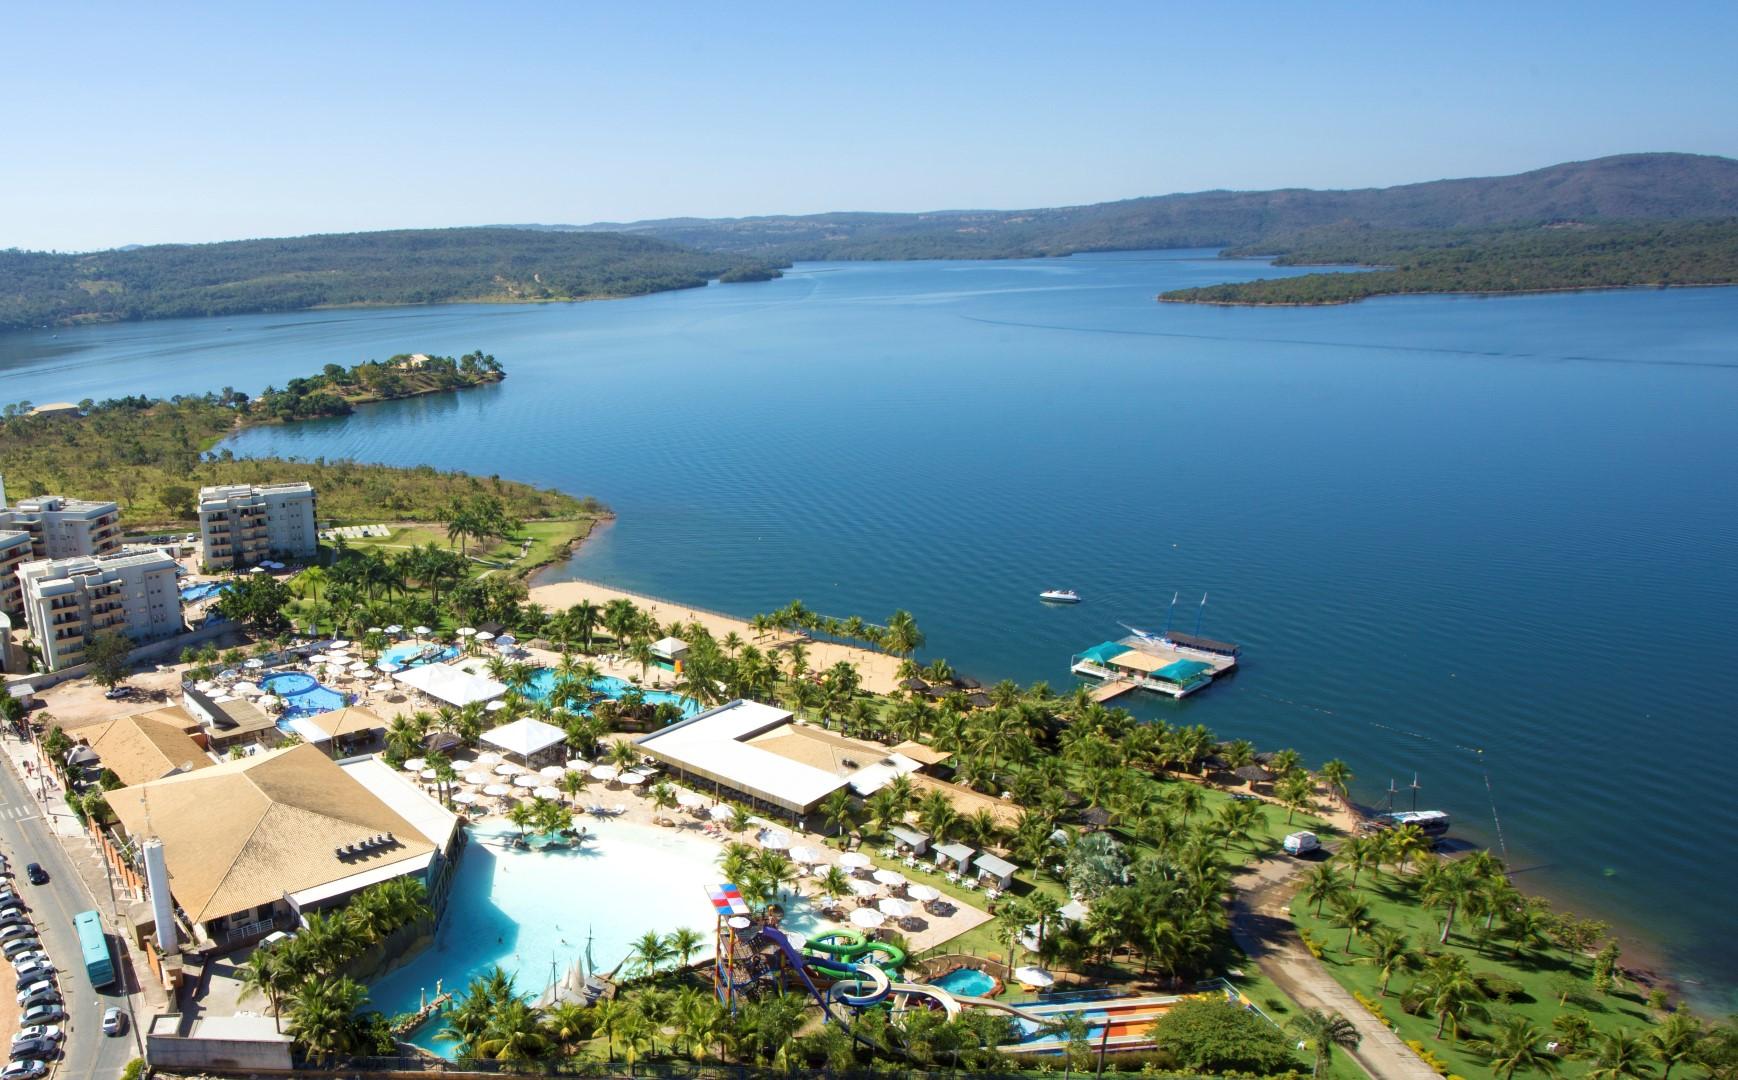 Vista do lago e do Náutico Praia Clube